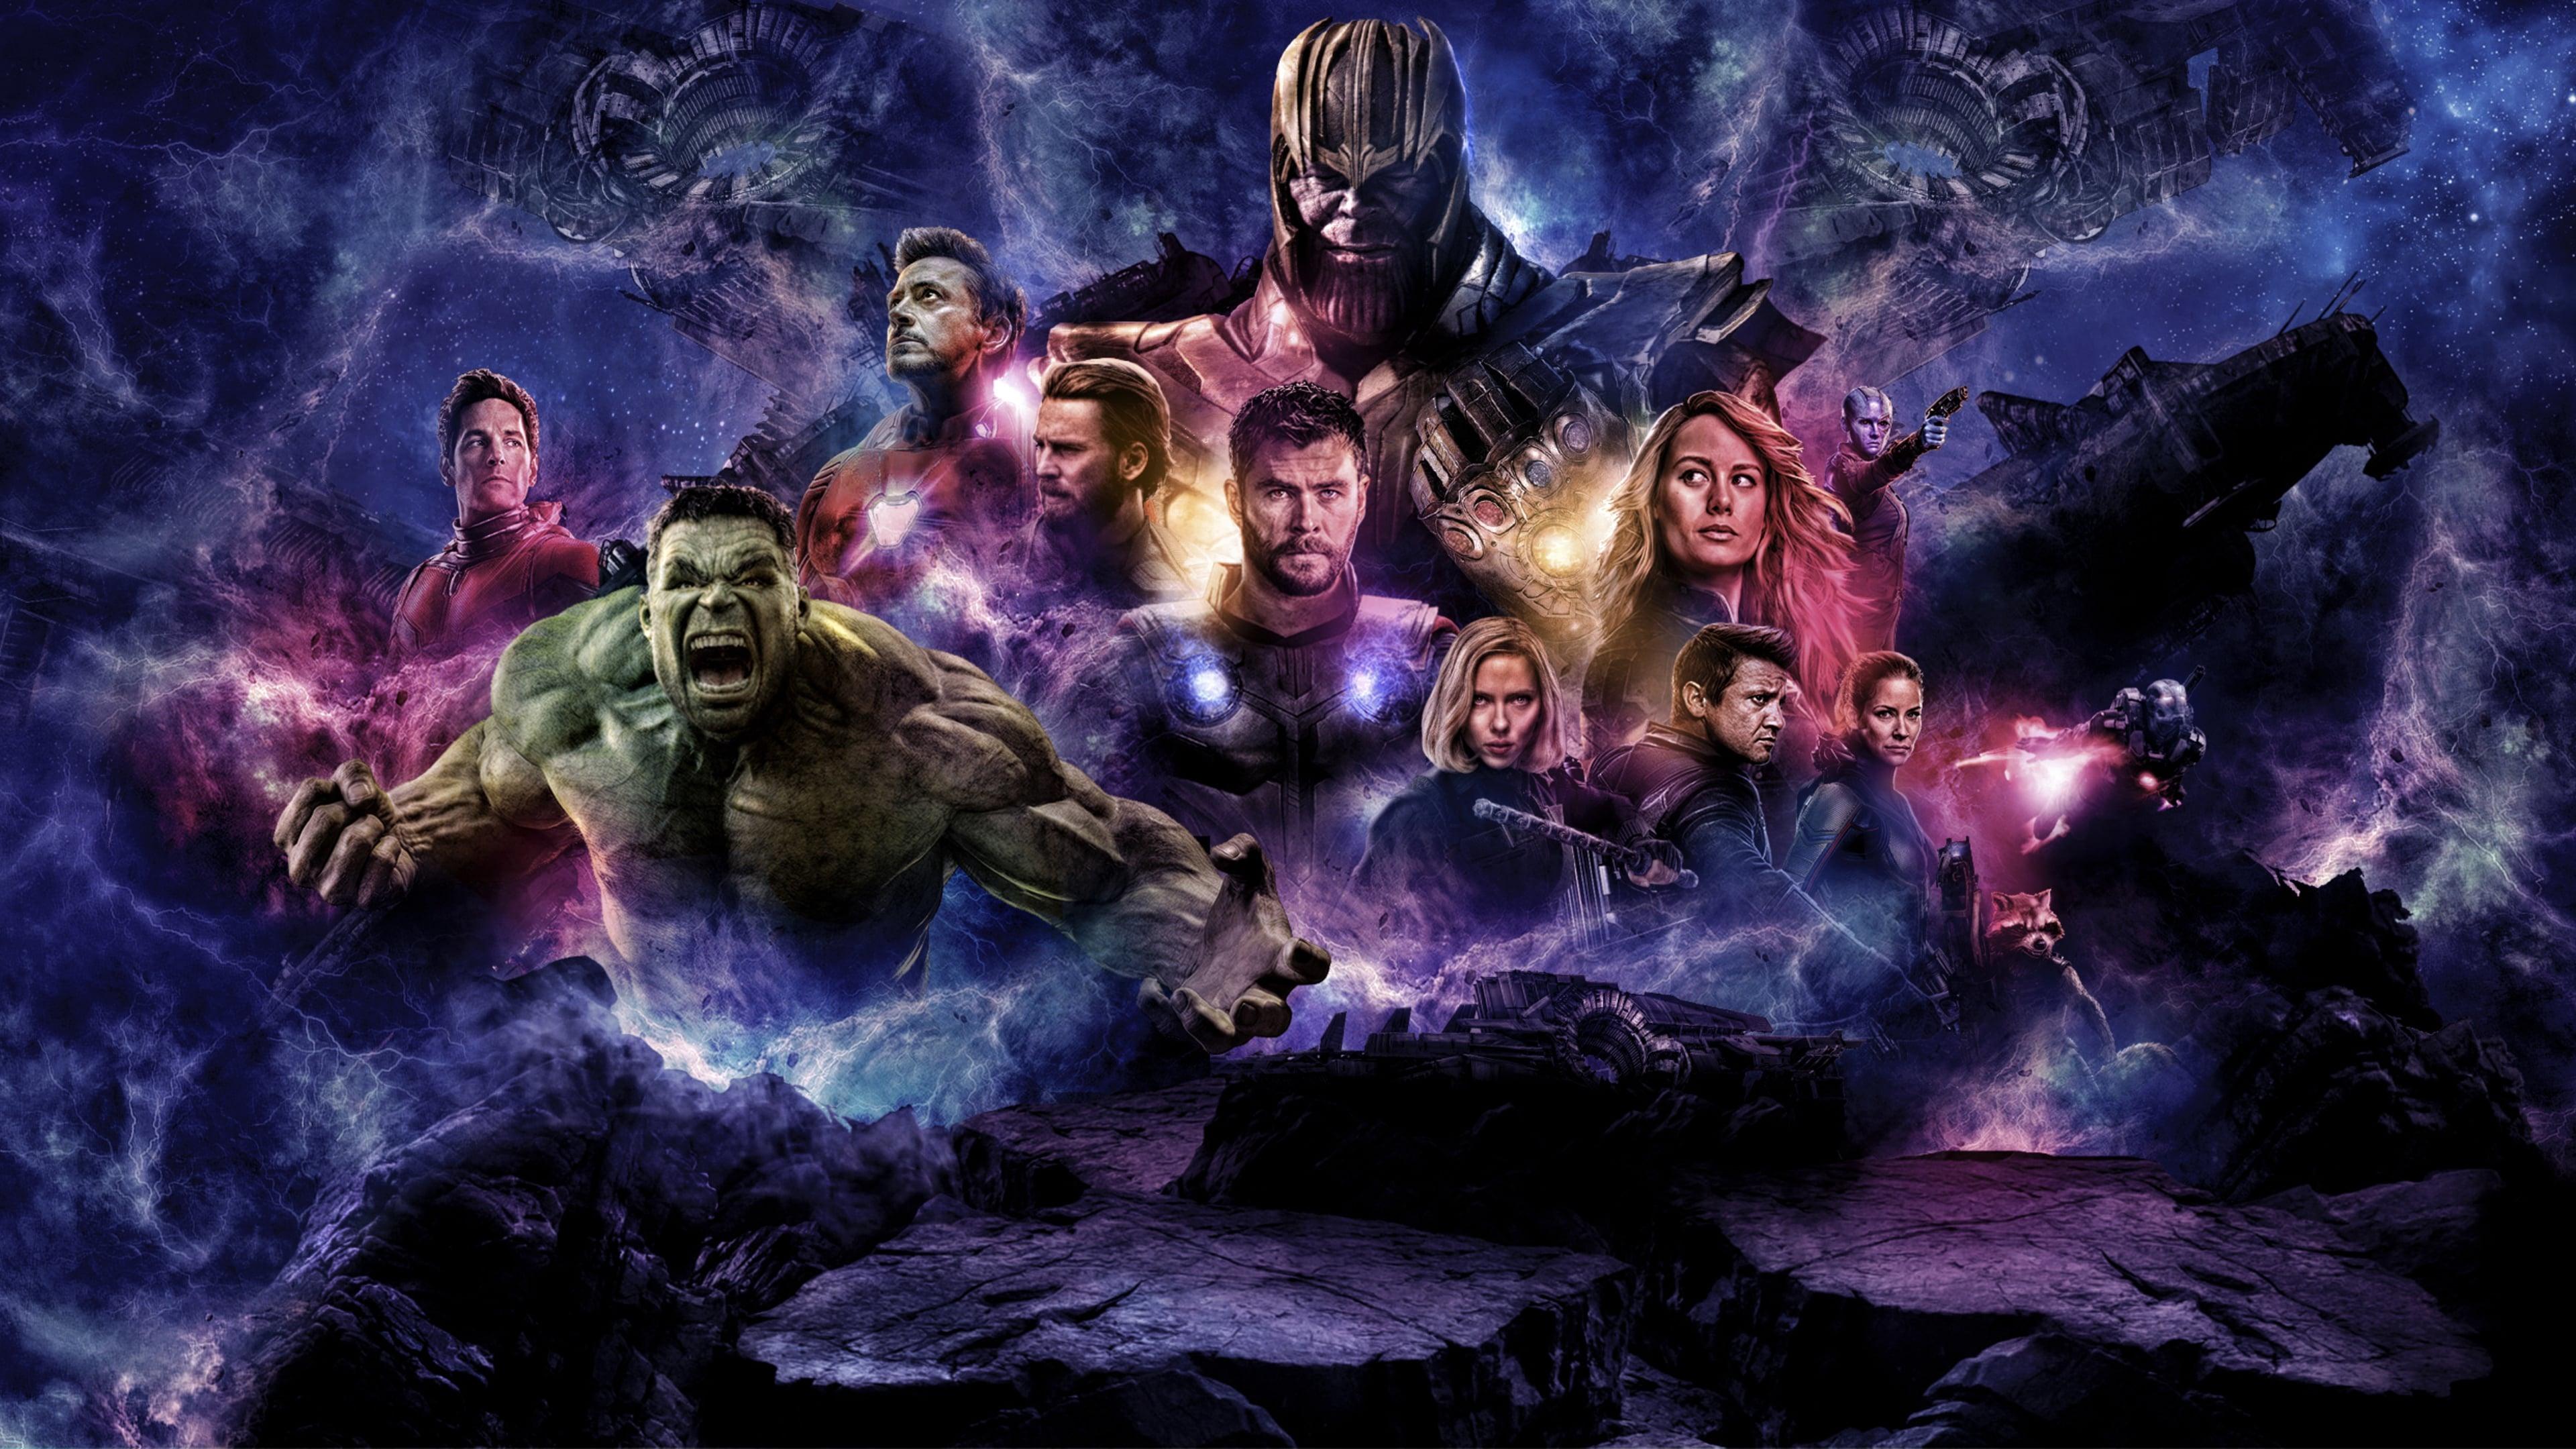 Wallpaper Avengers: Endgame, DC Comics movie 2019 ...